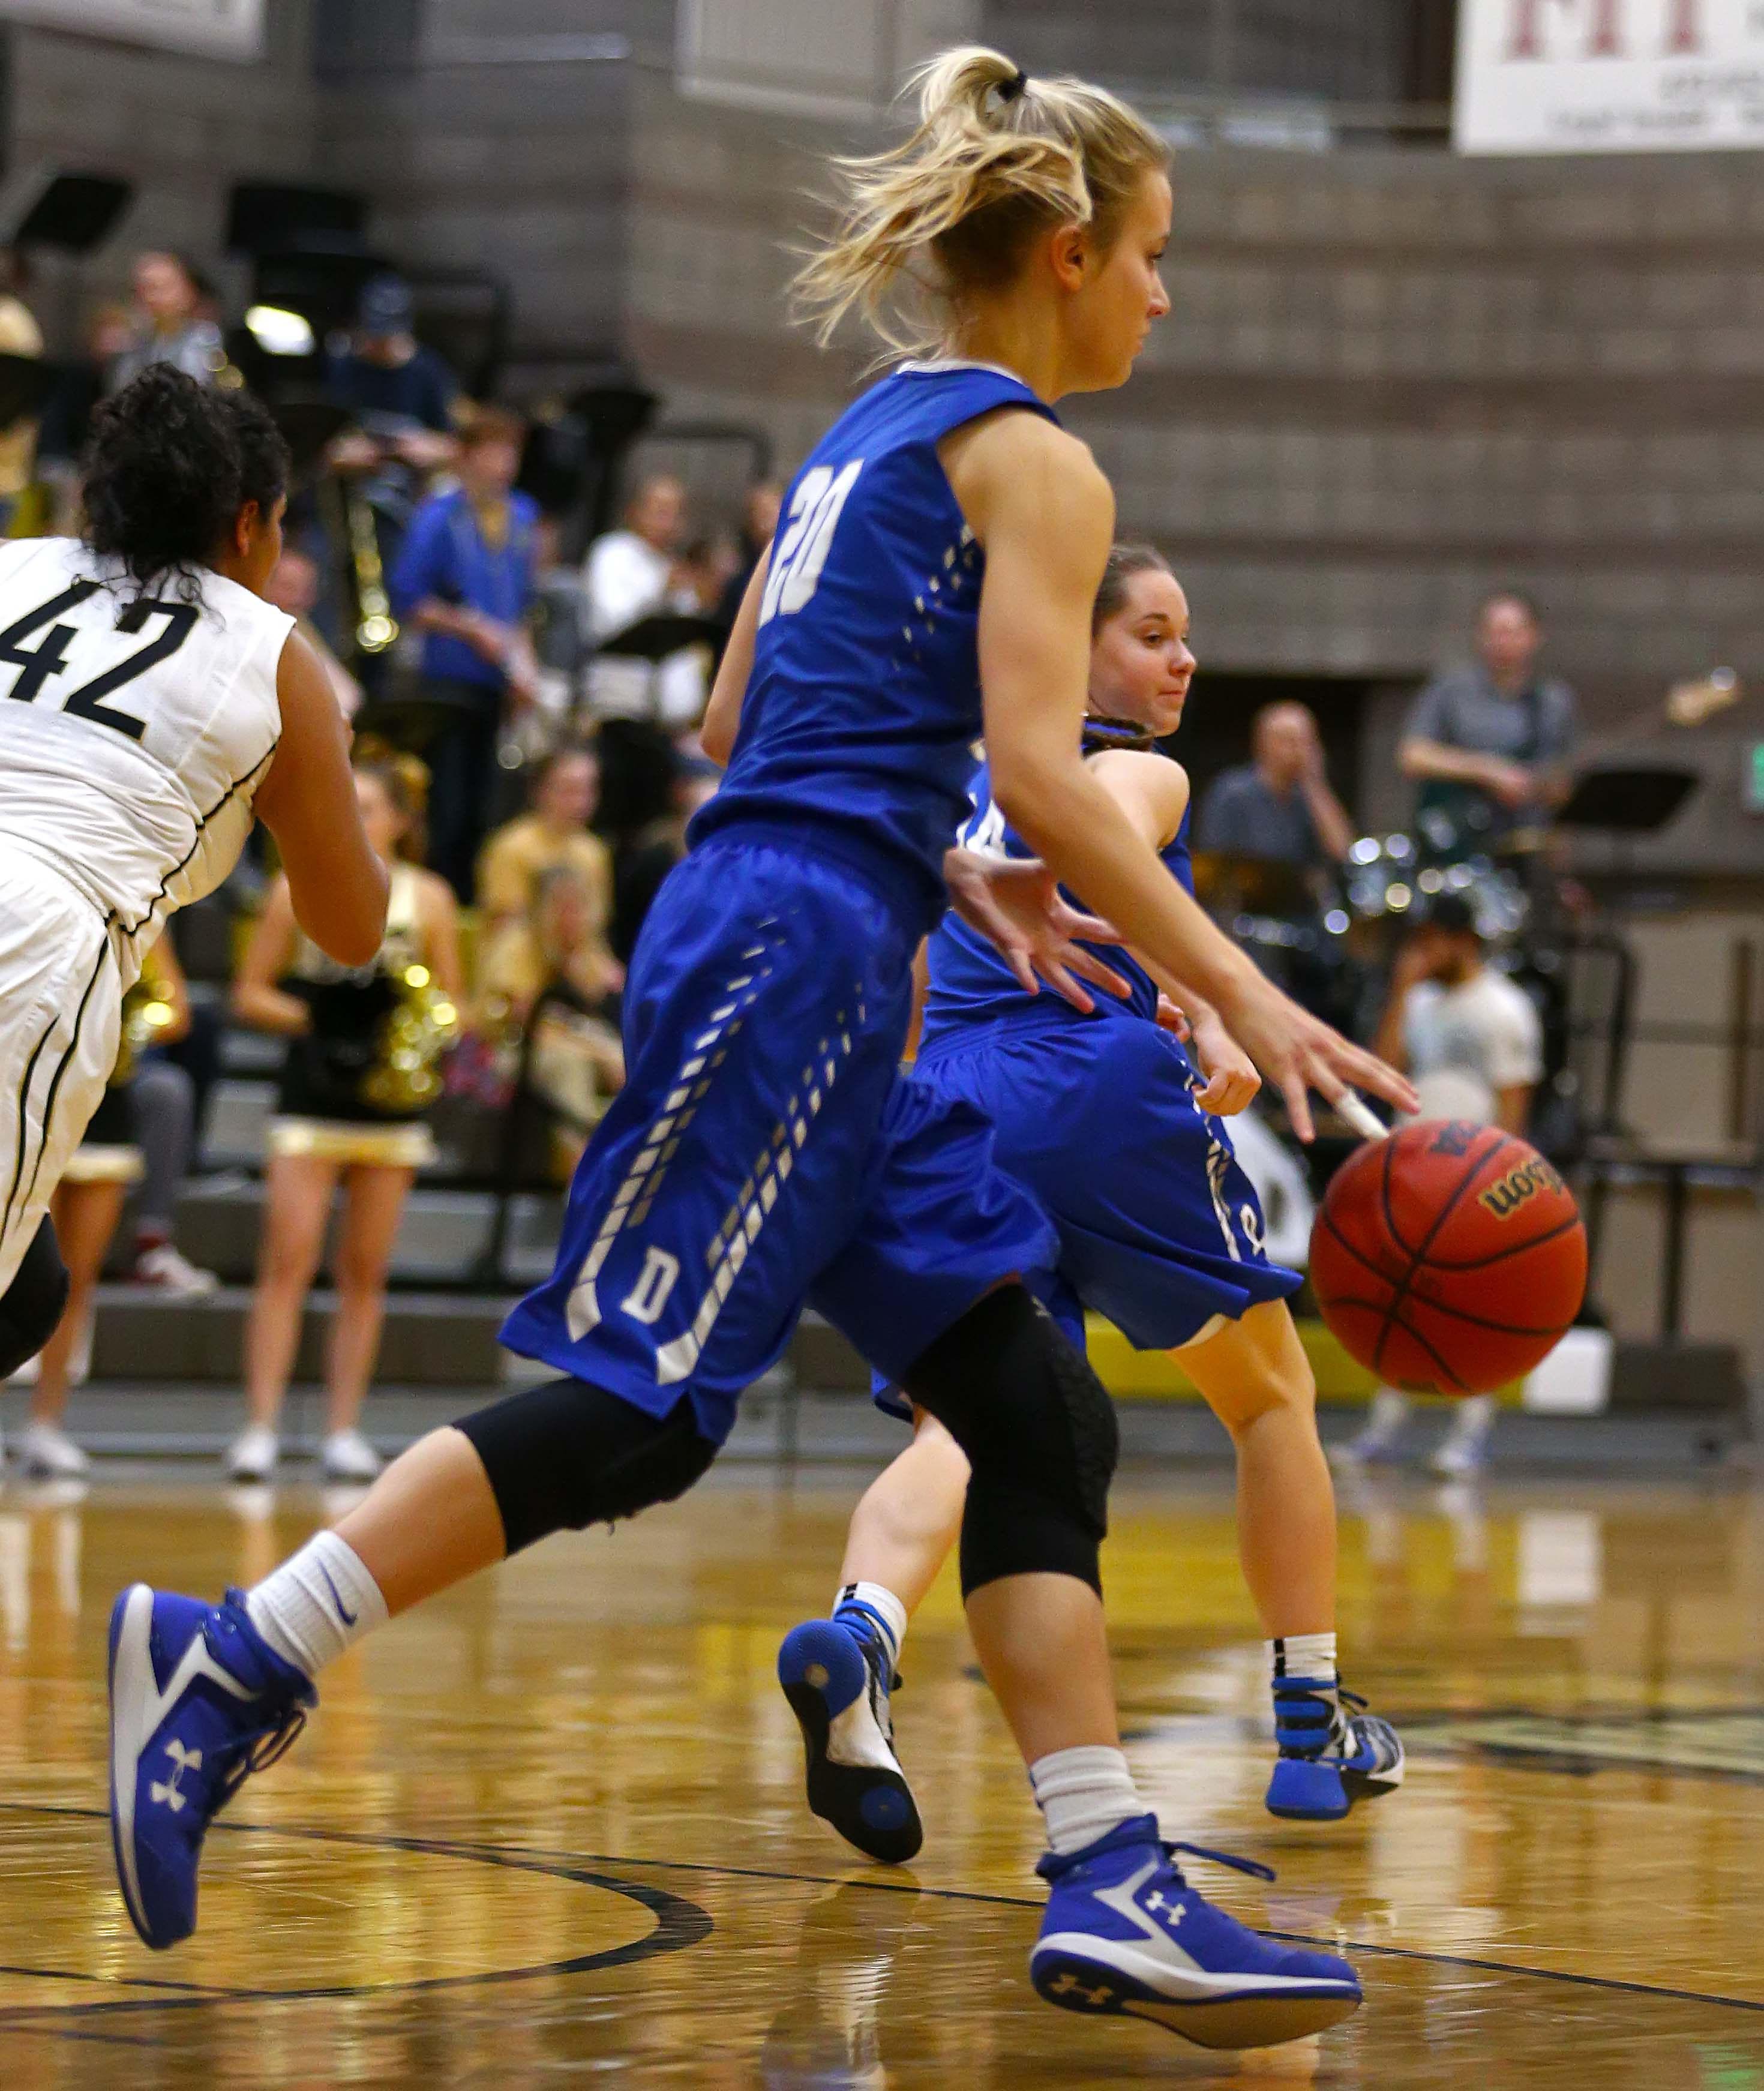 Dixie's Daisy Owens (20), Desert Hills vs. Dixie, Girls Basketball, St. George, Utah, Jan. 12, 2017,   Photo by Robert Hoppie, ASPpix.com, St. George News